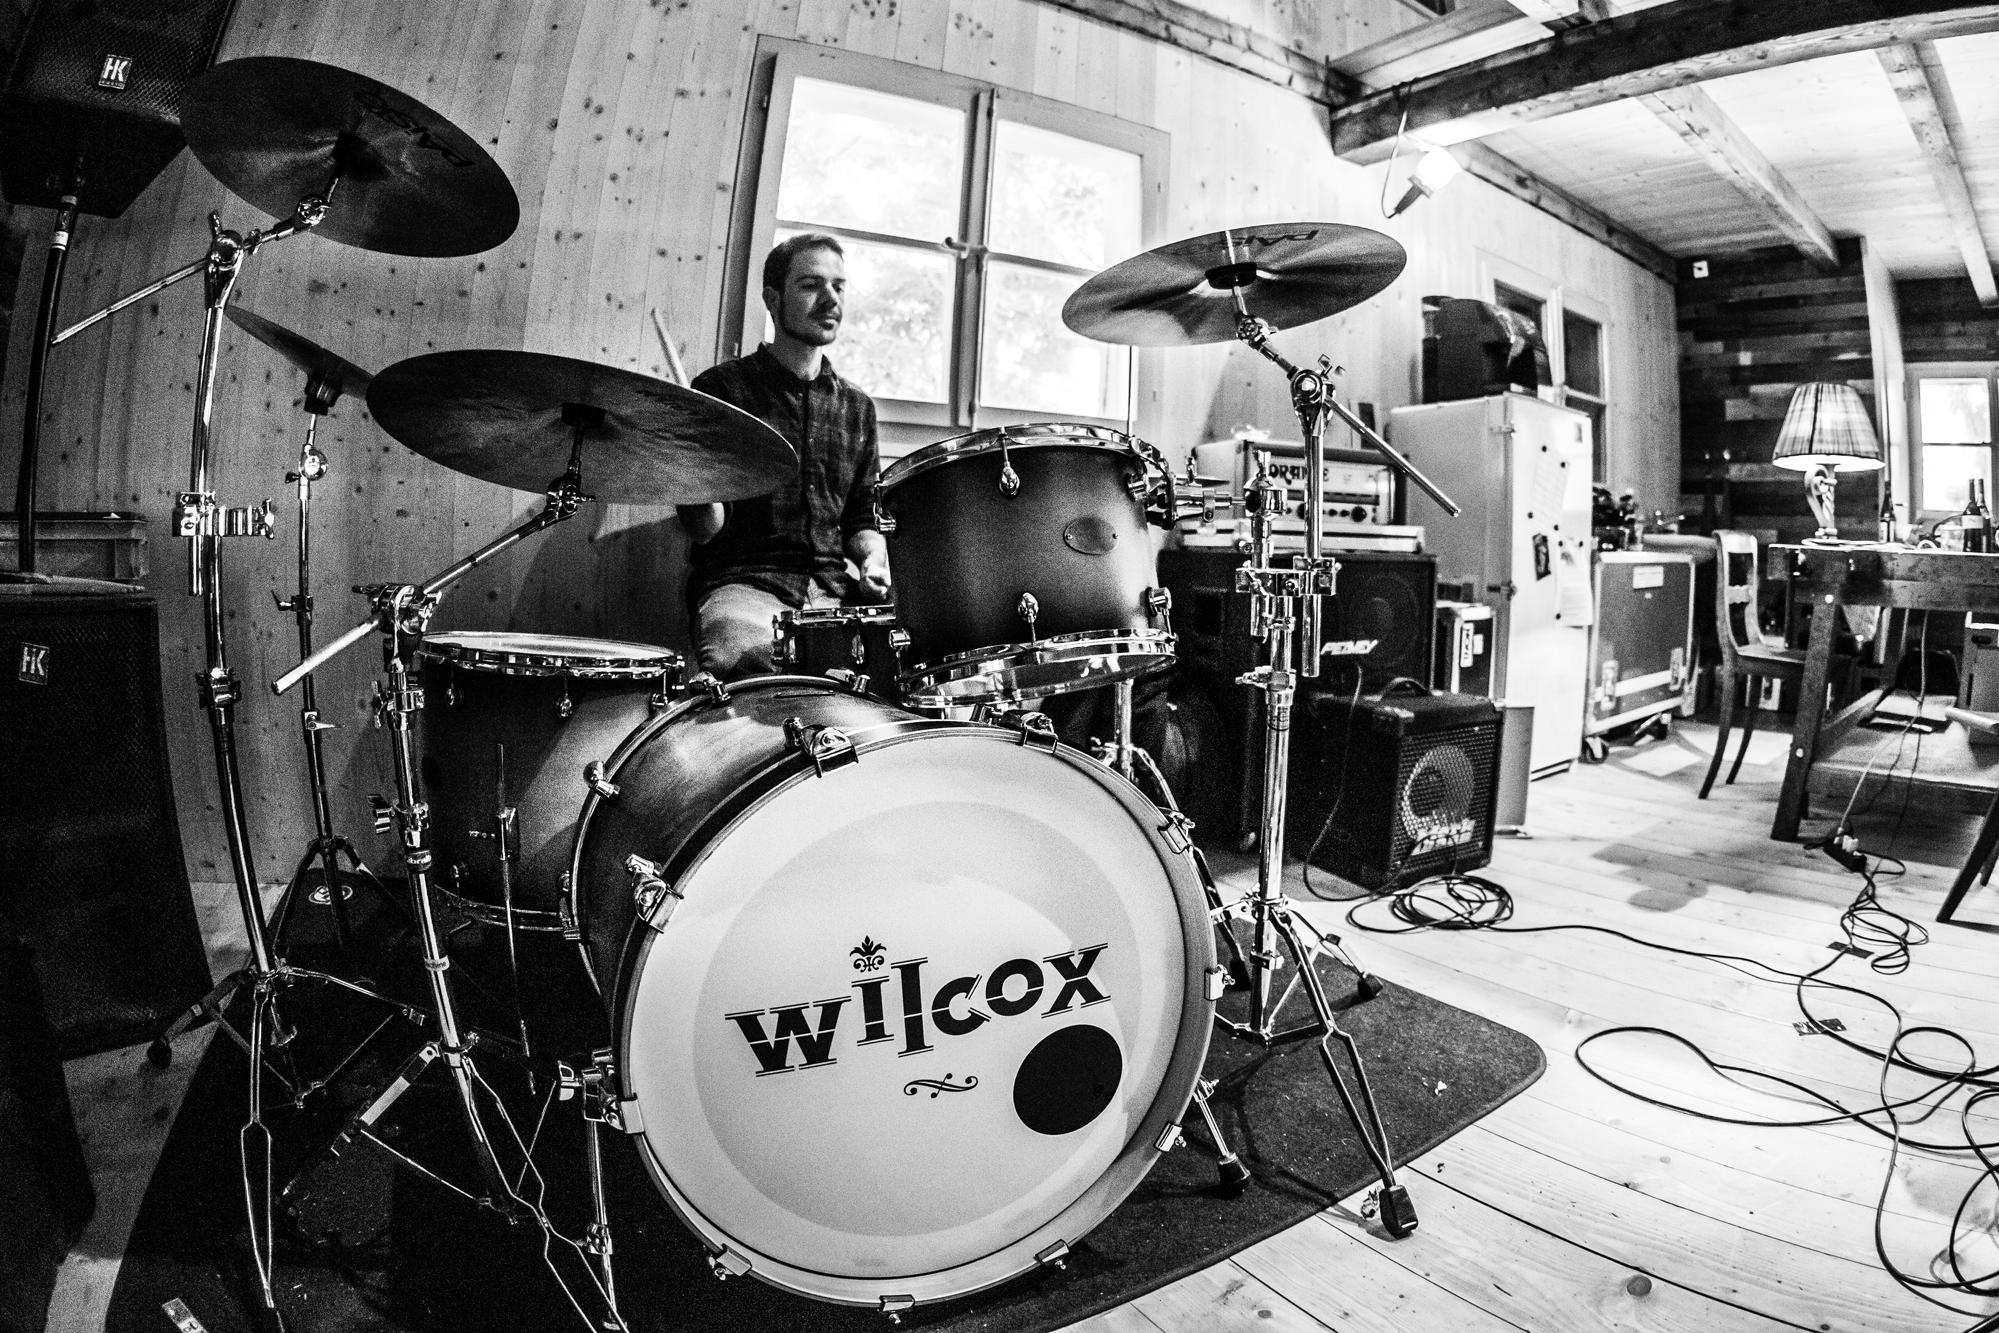 Wilcox im Proberaum